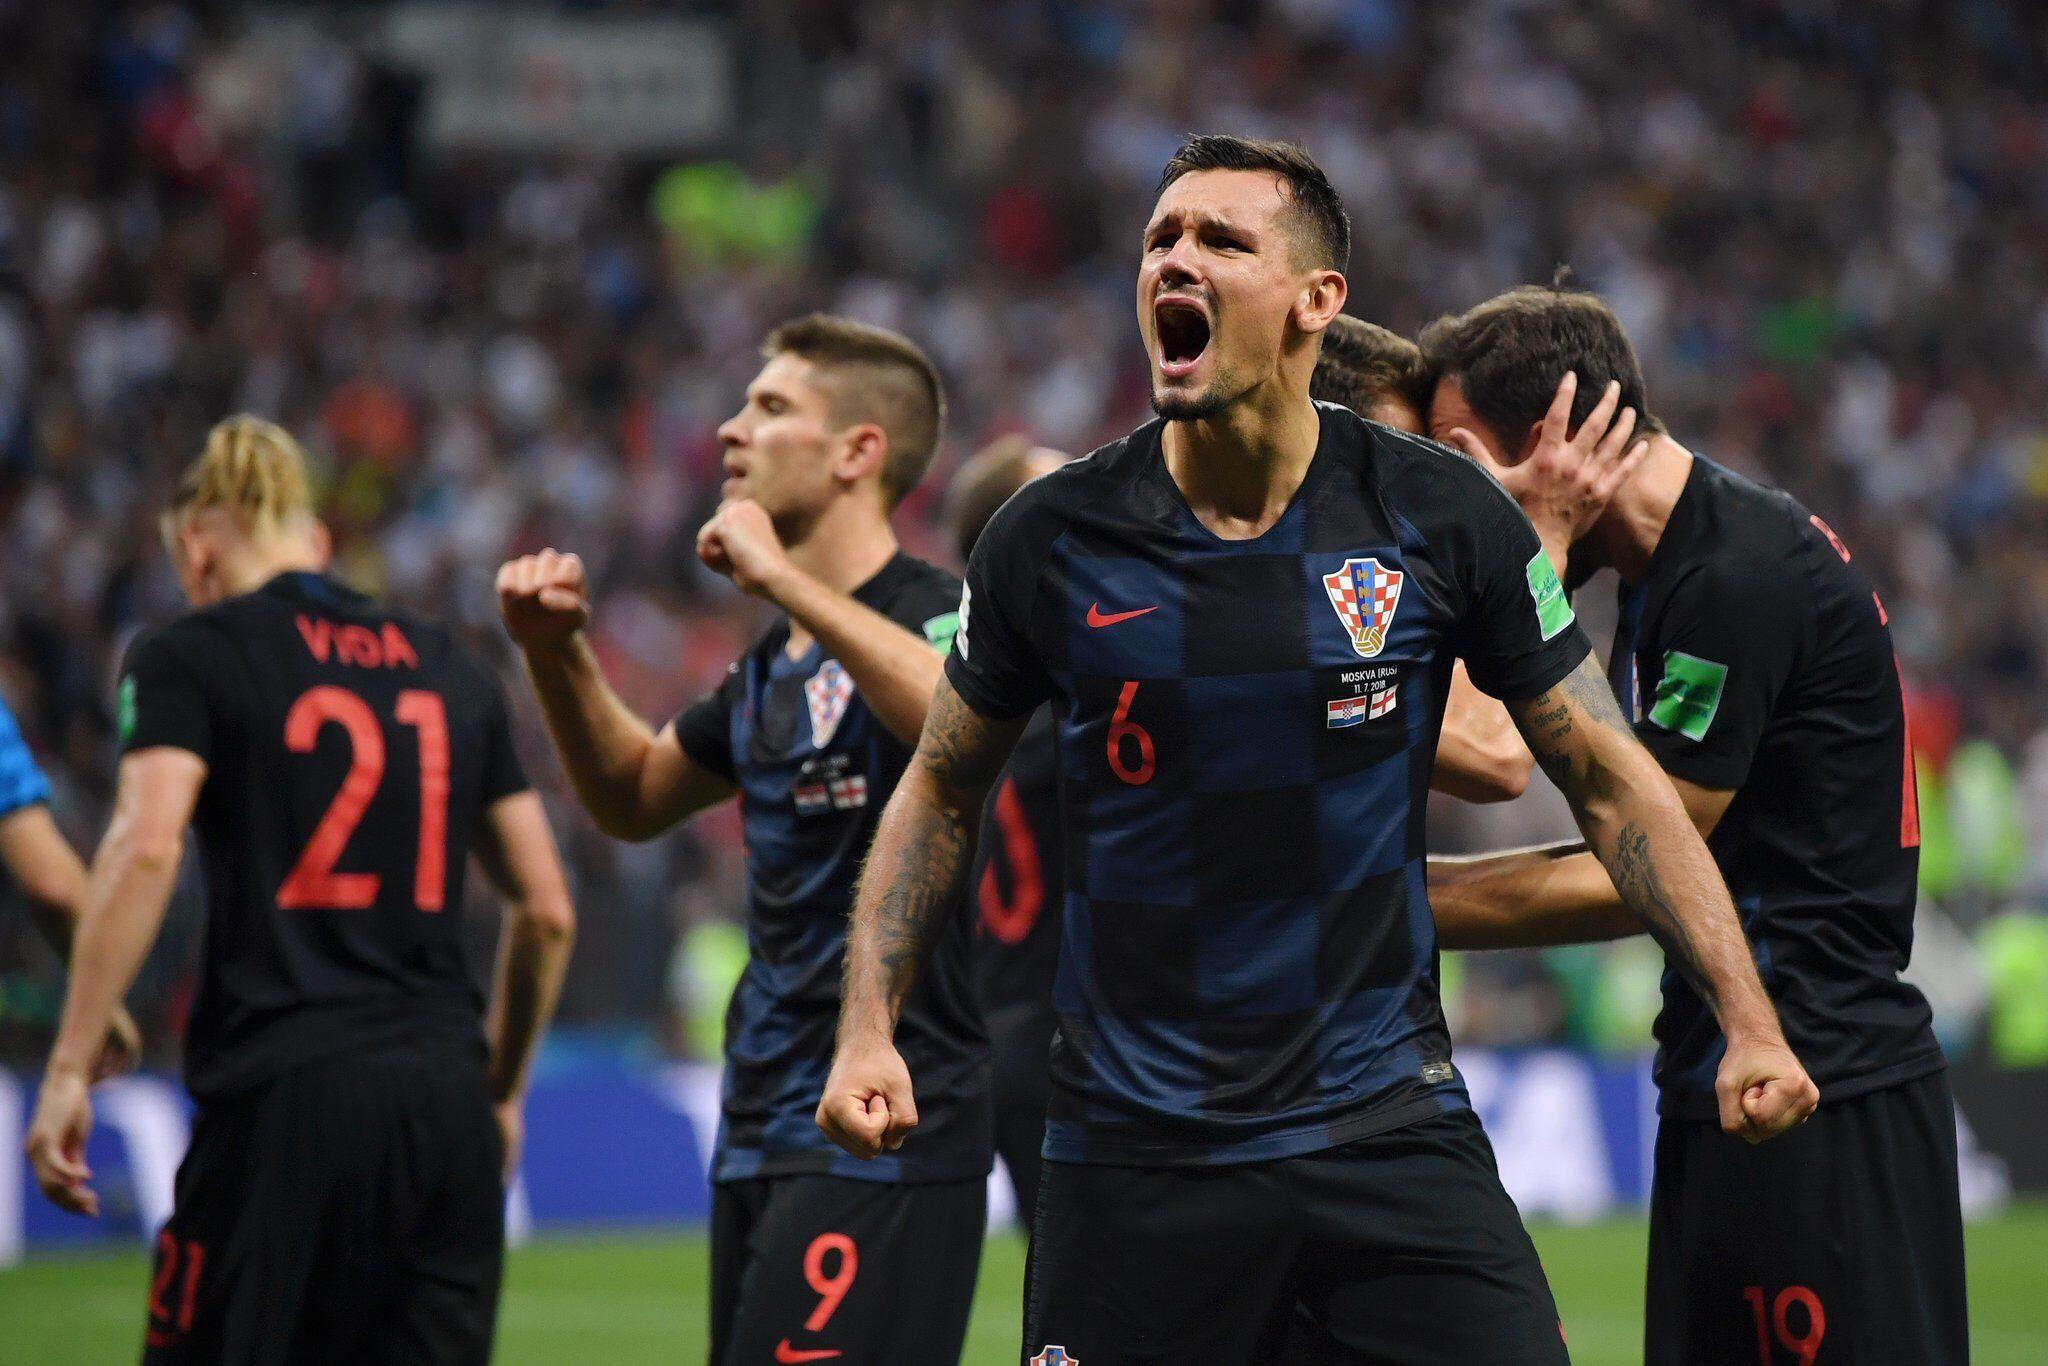 Lolos Final, Pemain Kroasia Ungkap Komentar Pedas pada Media Inggris